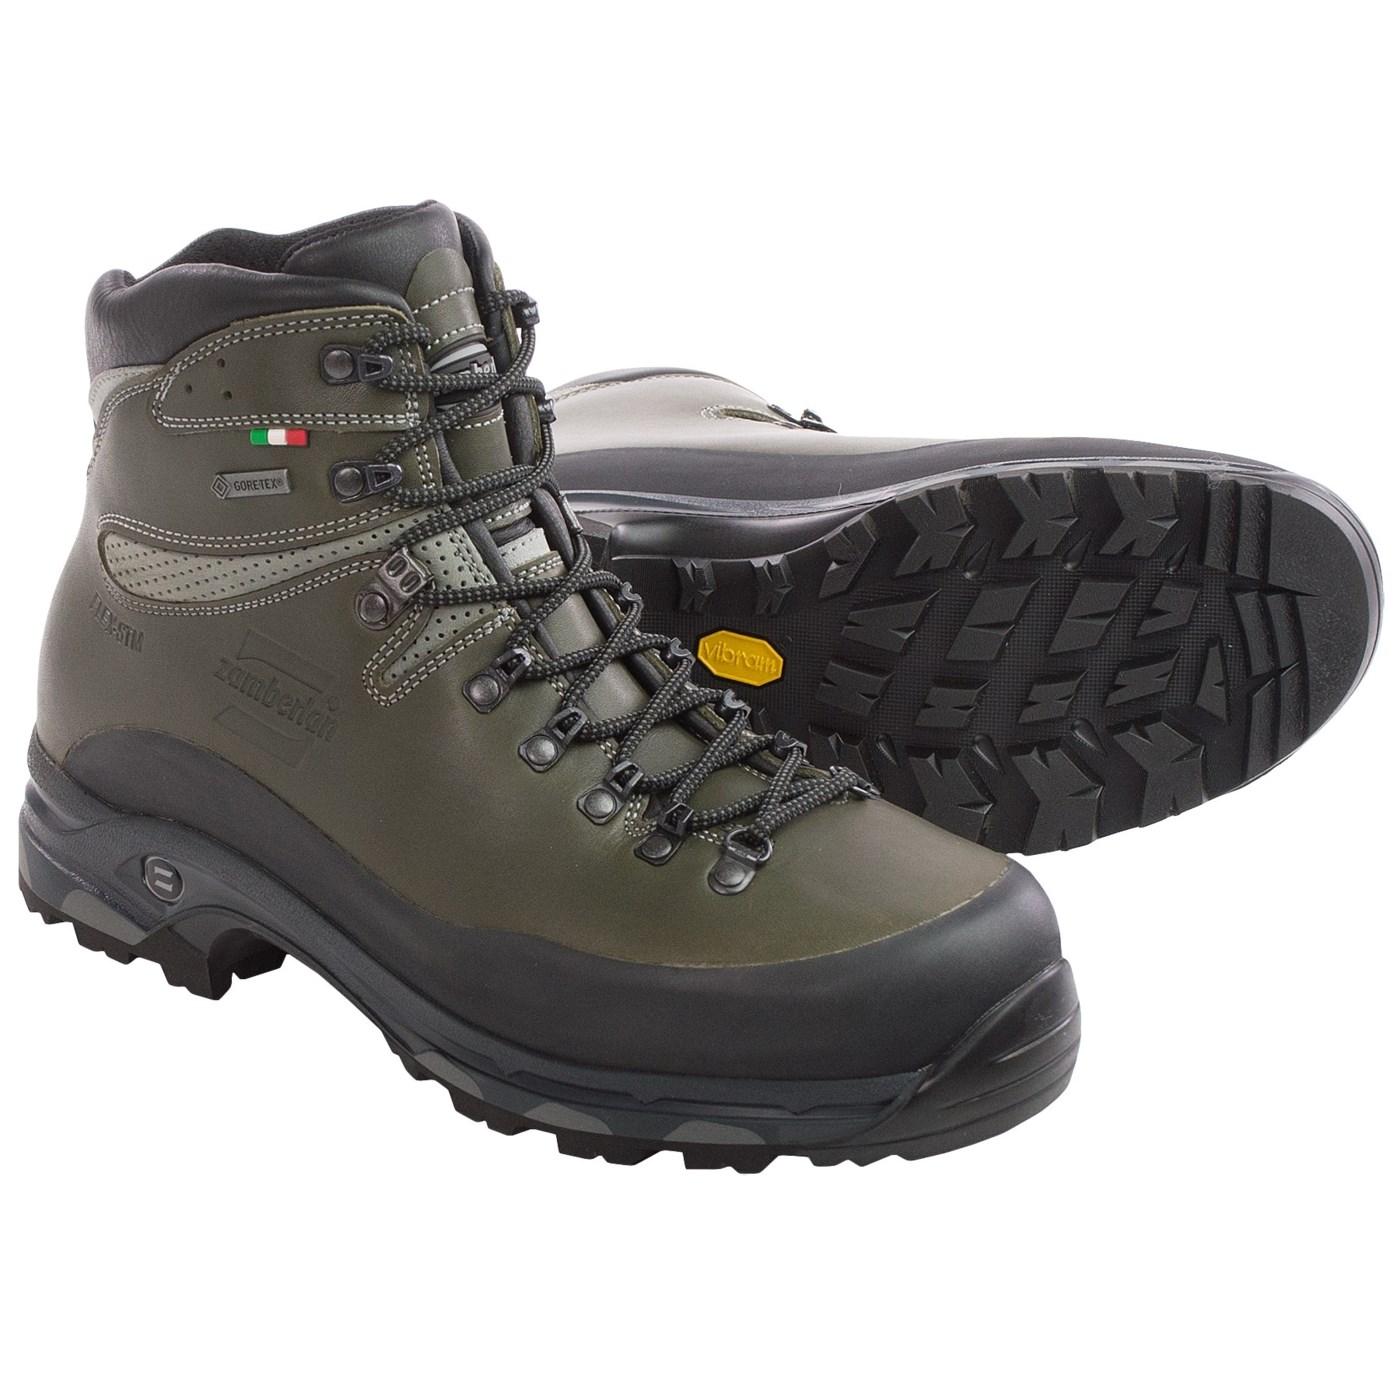 fcf18e989be Zamberlan Vioz Plus Gore Tex® RR Hunting Boots (For Men) 9947K 32 on ...